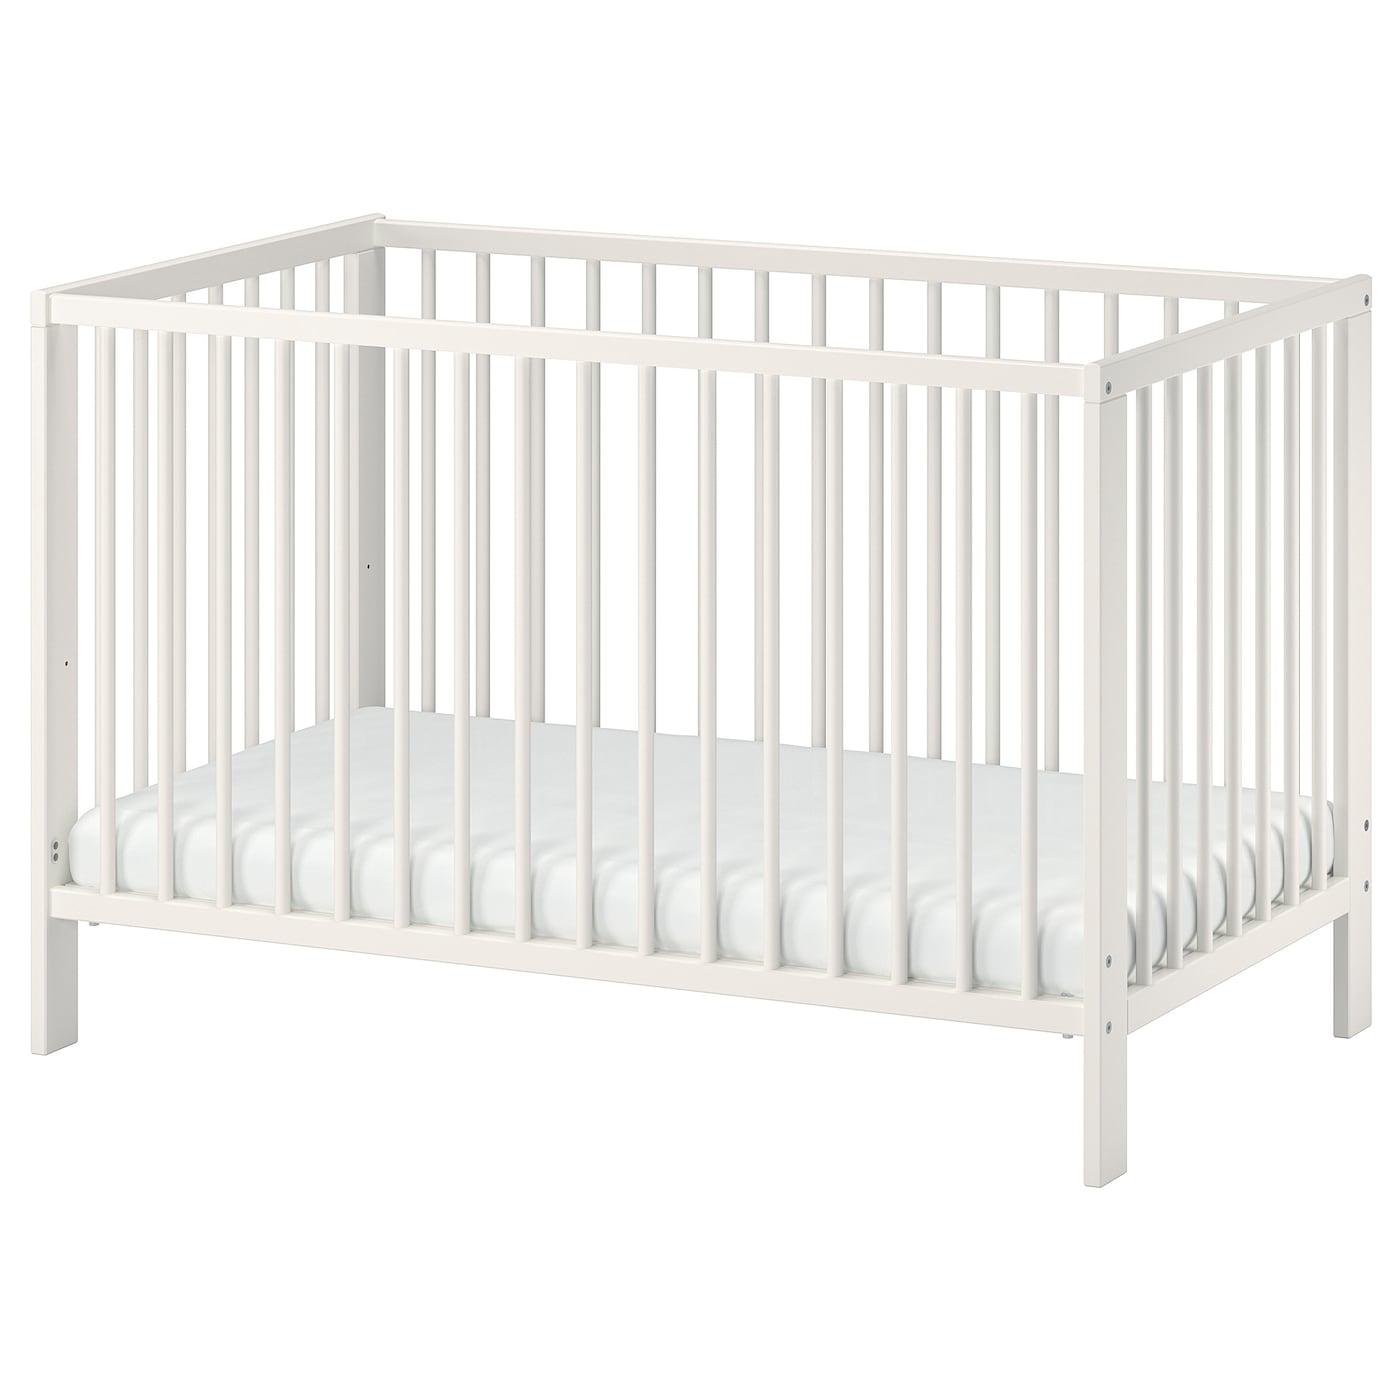 Te Koop Babybedje.Gulliver Babybedje Wit 60 X 120 Cm Ikea